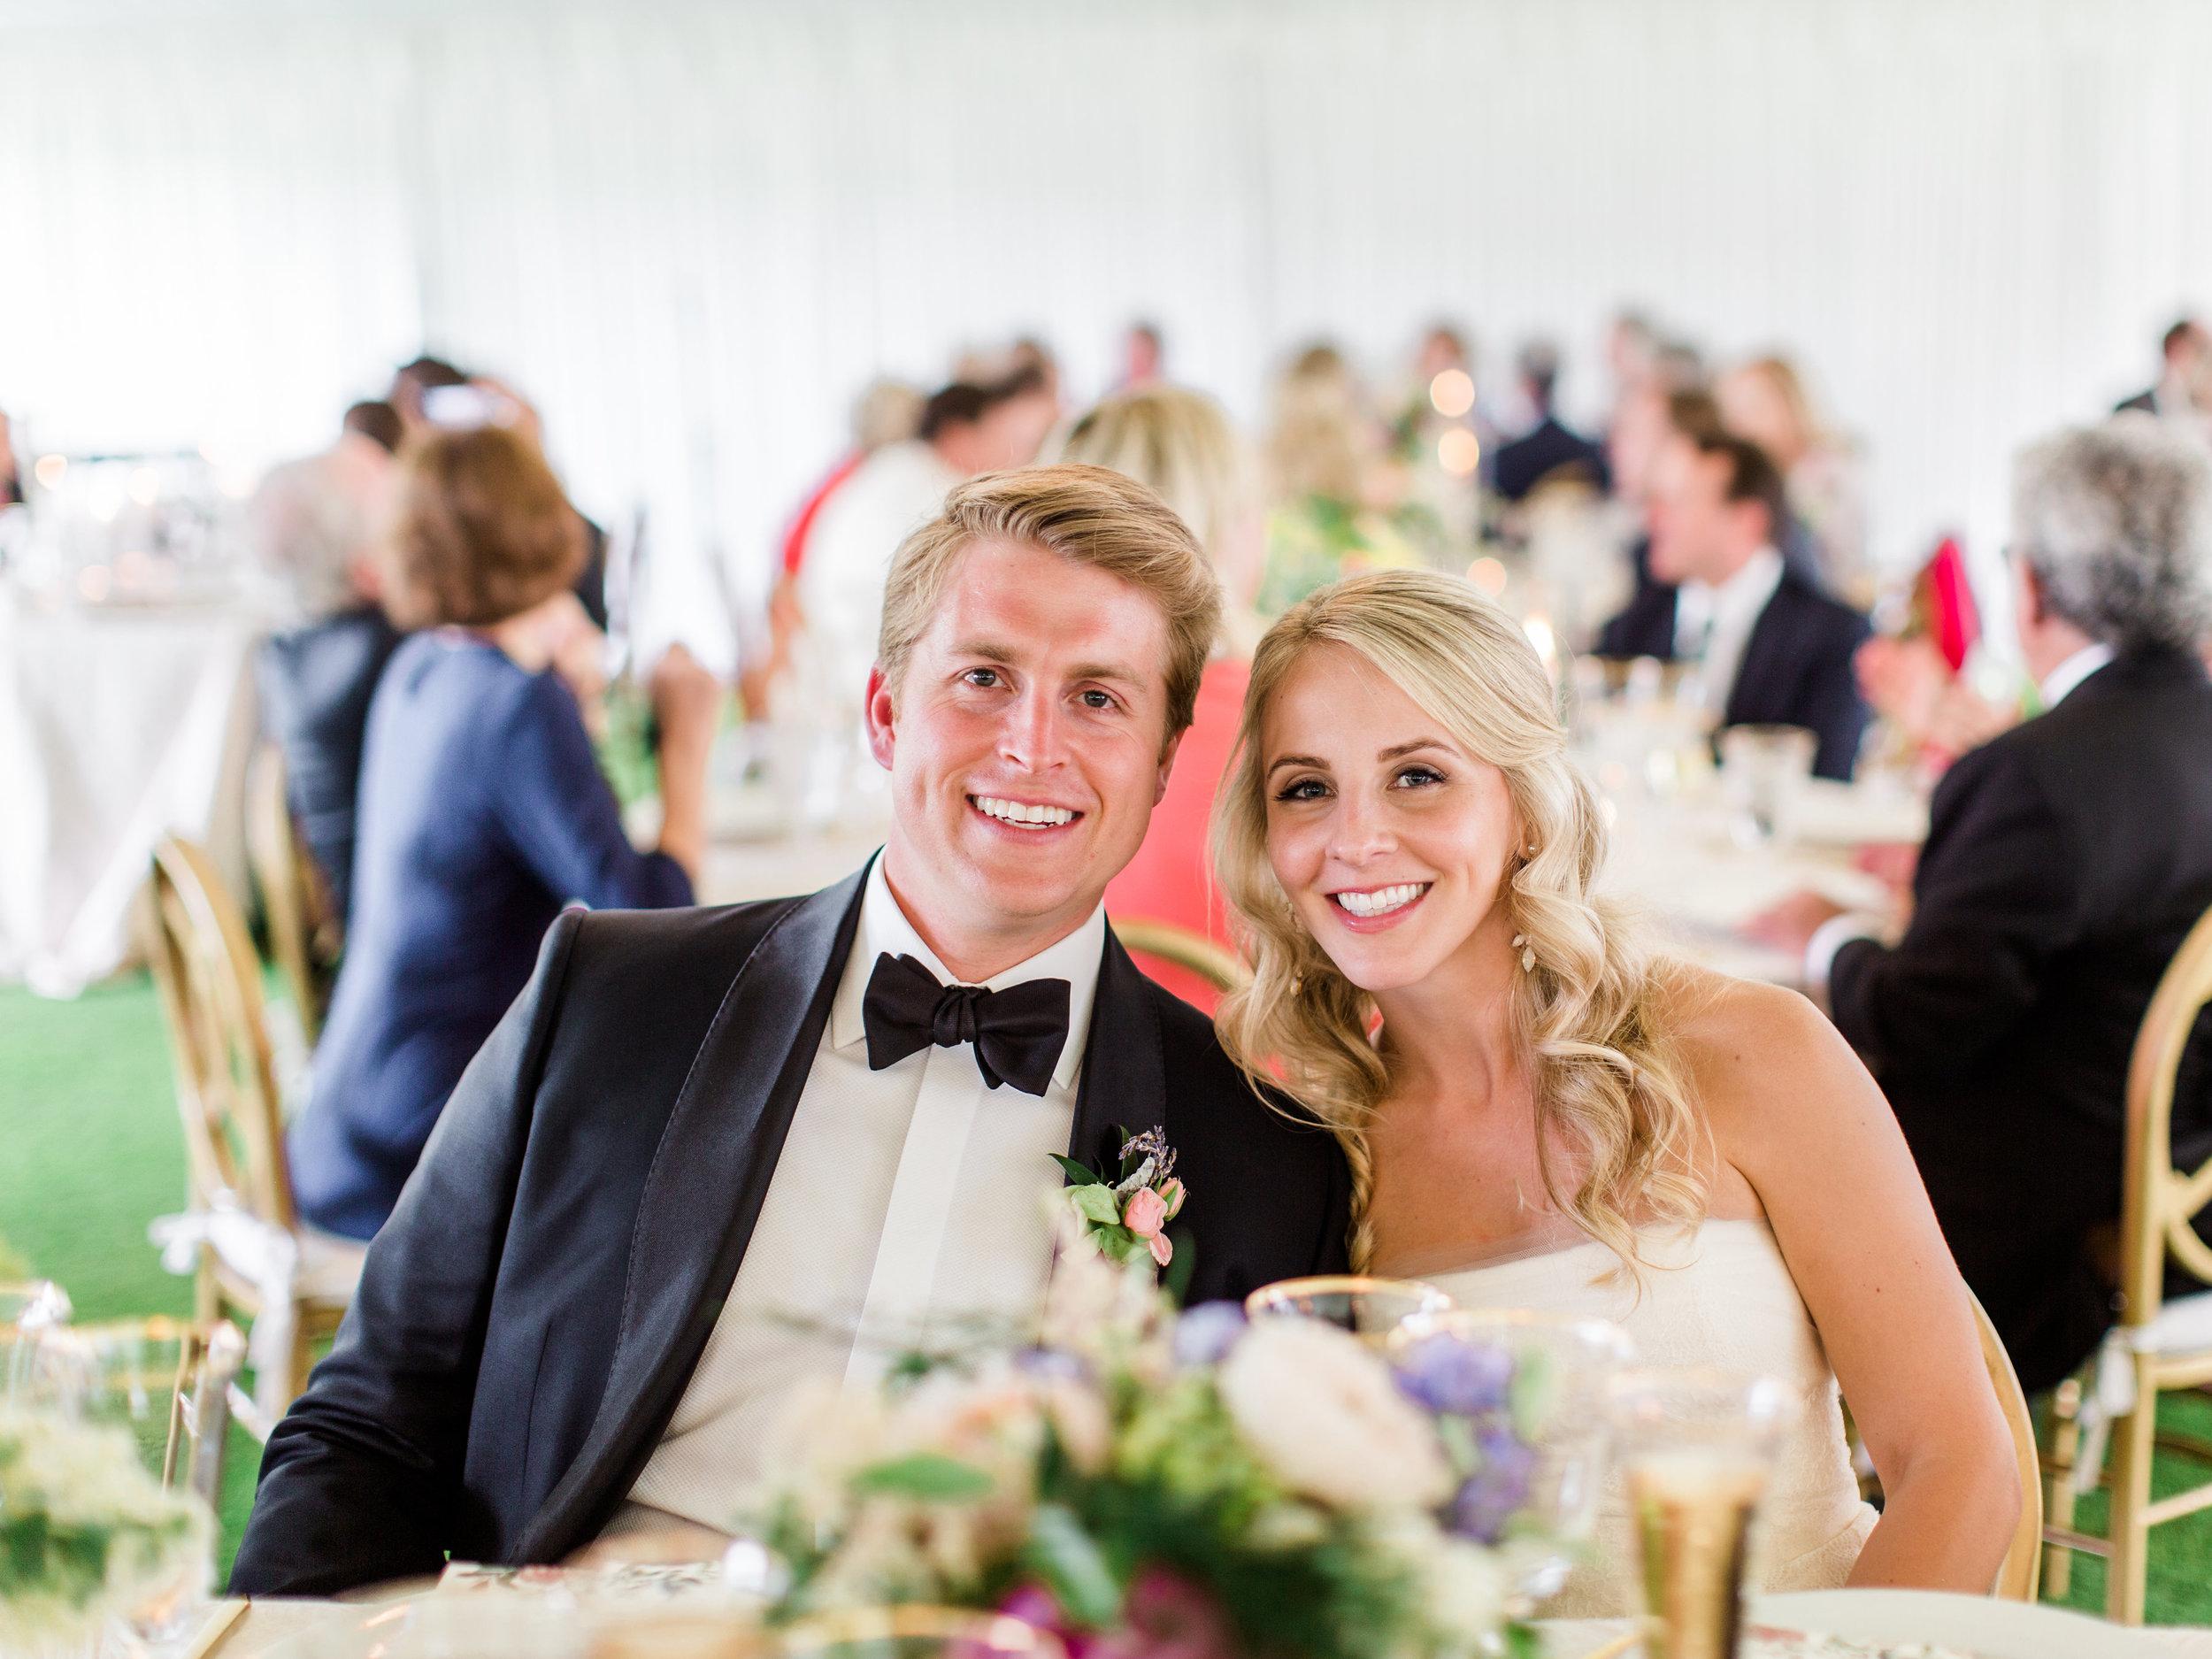 Coffman+Wedding+Reception-29.jpg